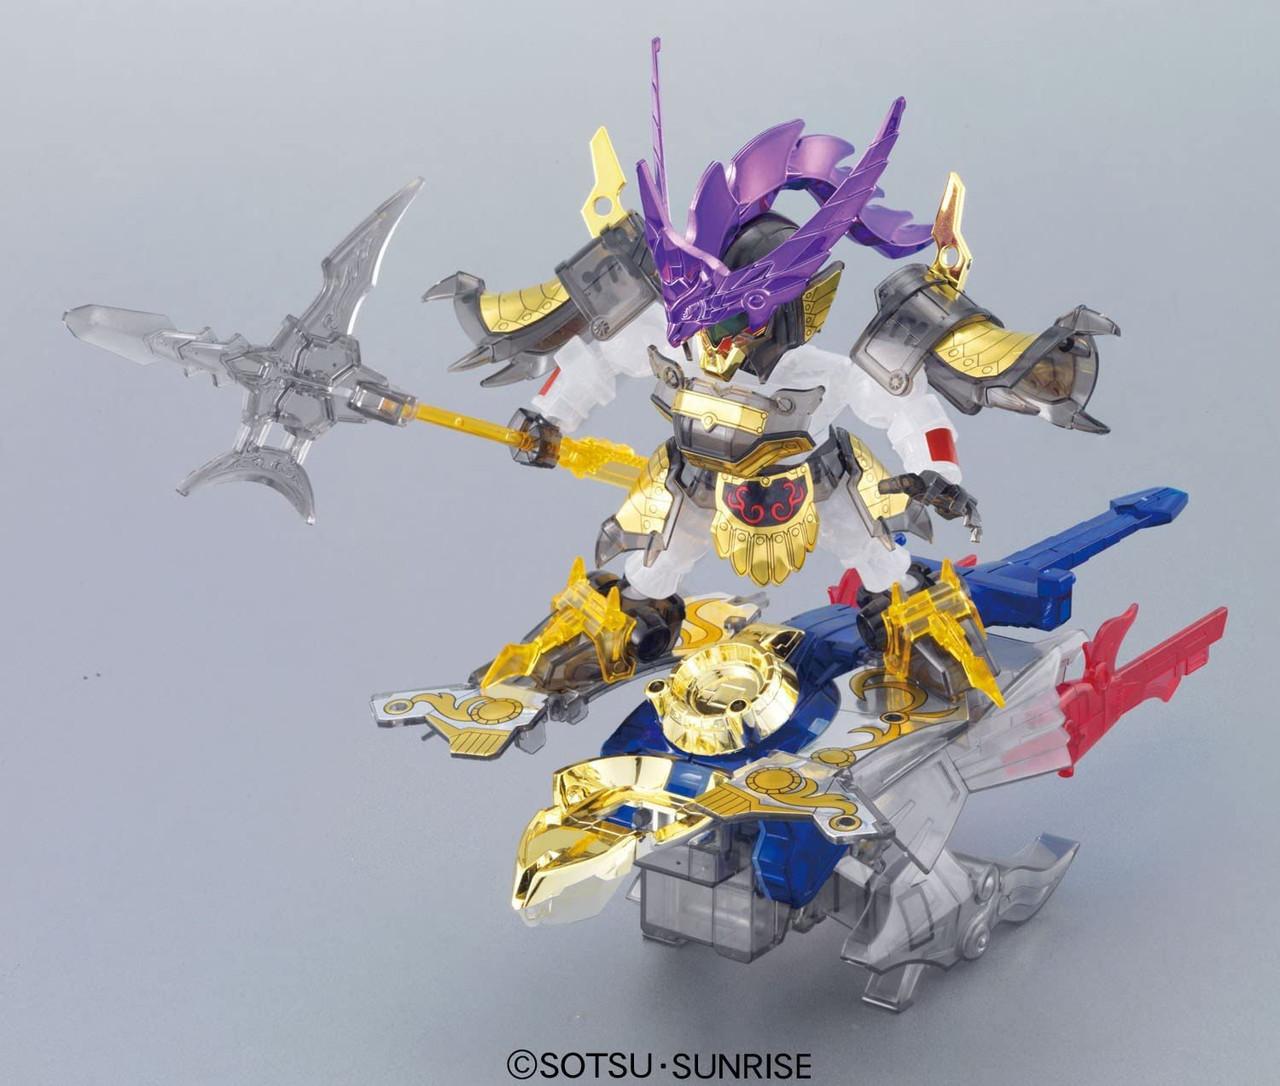 BANDAI SPIRITS SD Gundam Sangokuden Brave Battle Warriors Tallgeese / Akatsukima / Tentama Armor Clear color version